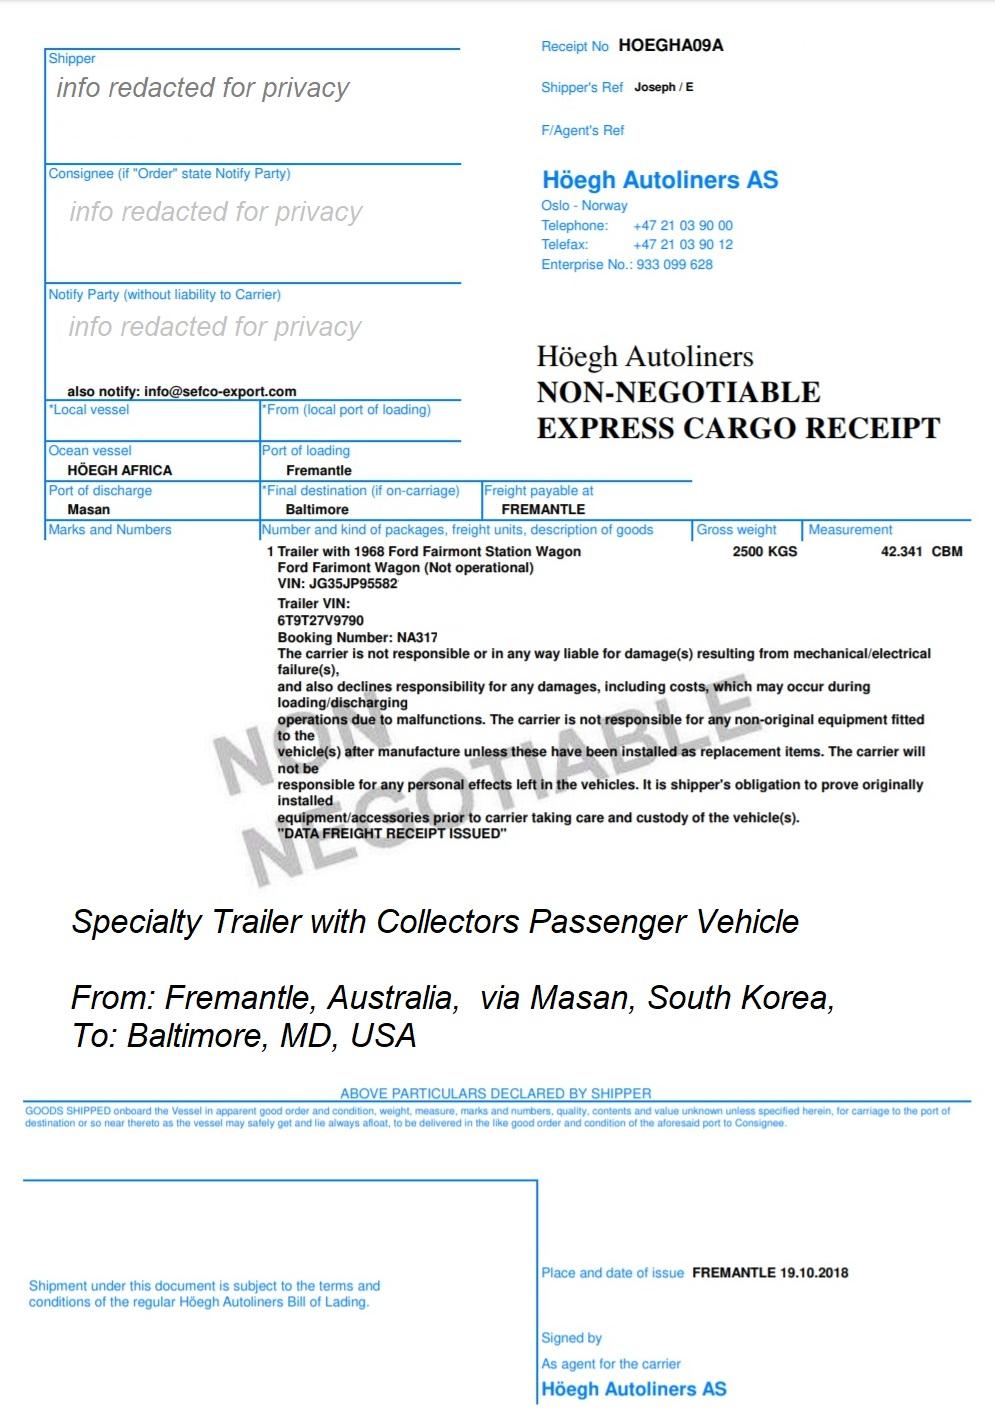 Ship High & Heavy Equipment & Vehicles Internationally - USA